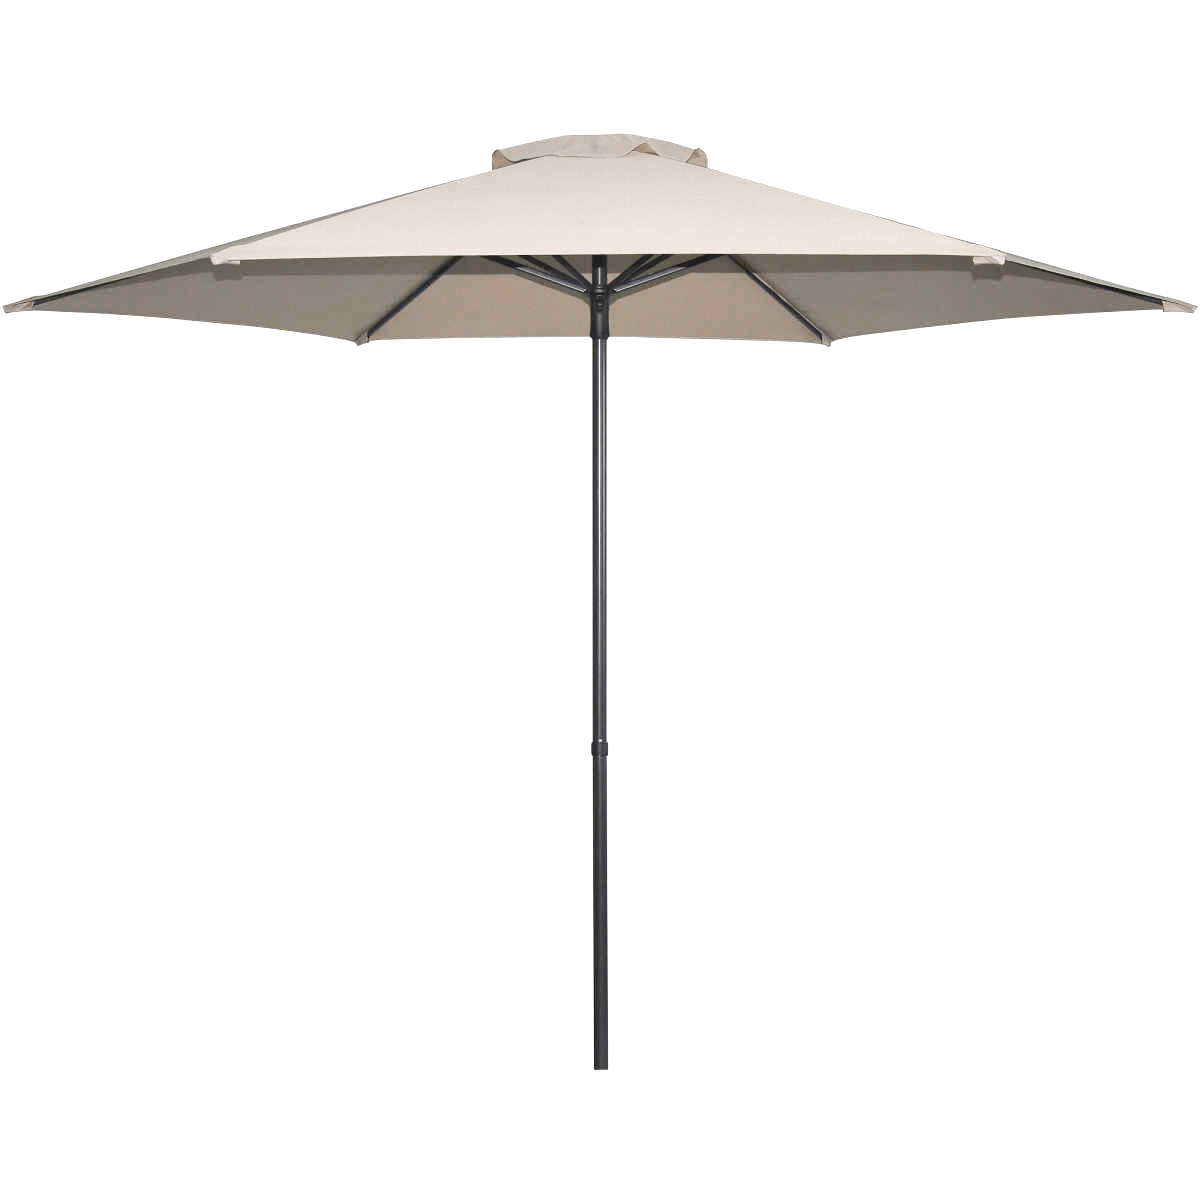 Market Umbrellas In 2019 Market Umbrella (View 4 of 20)